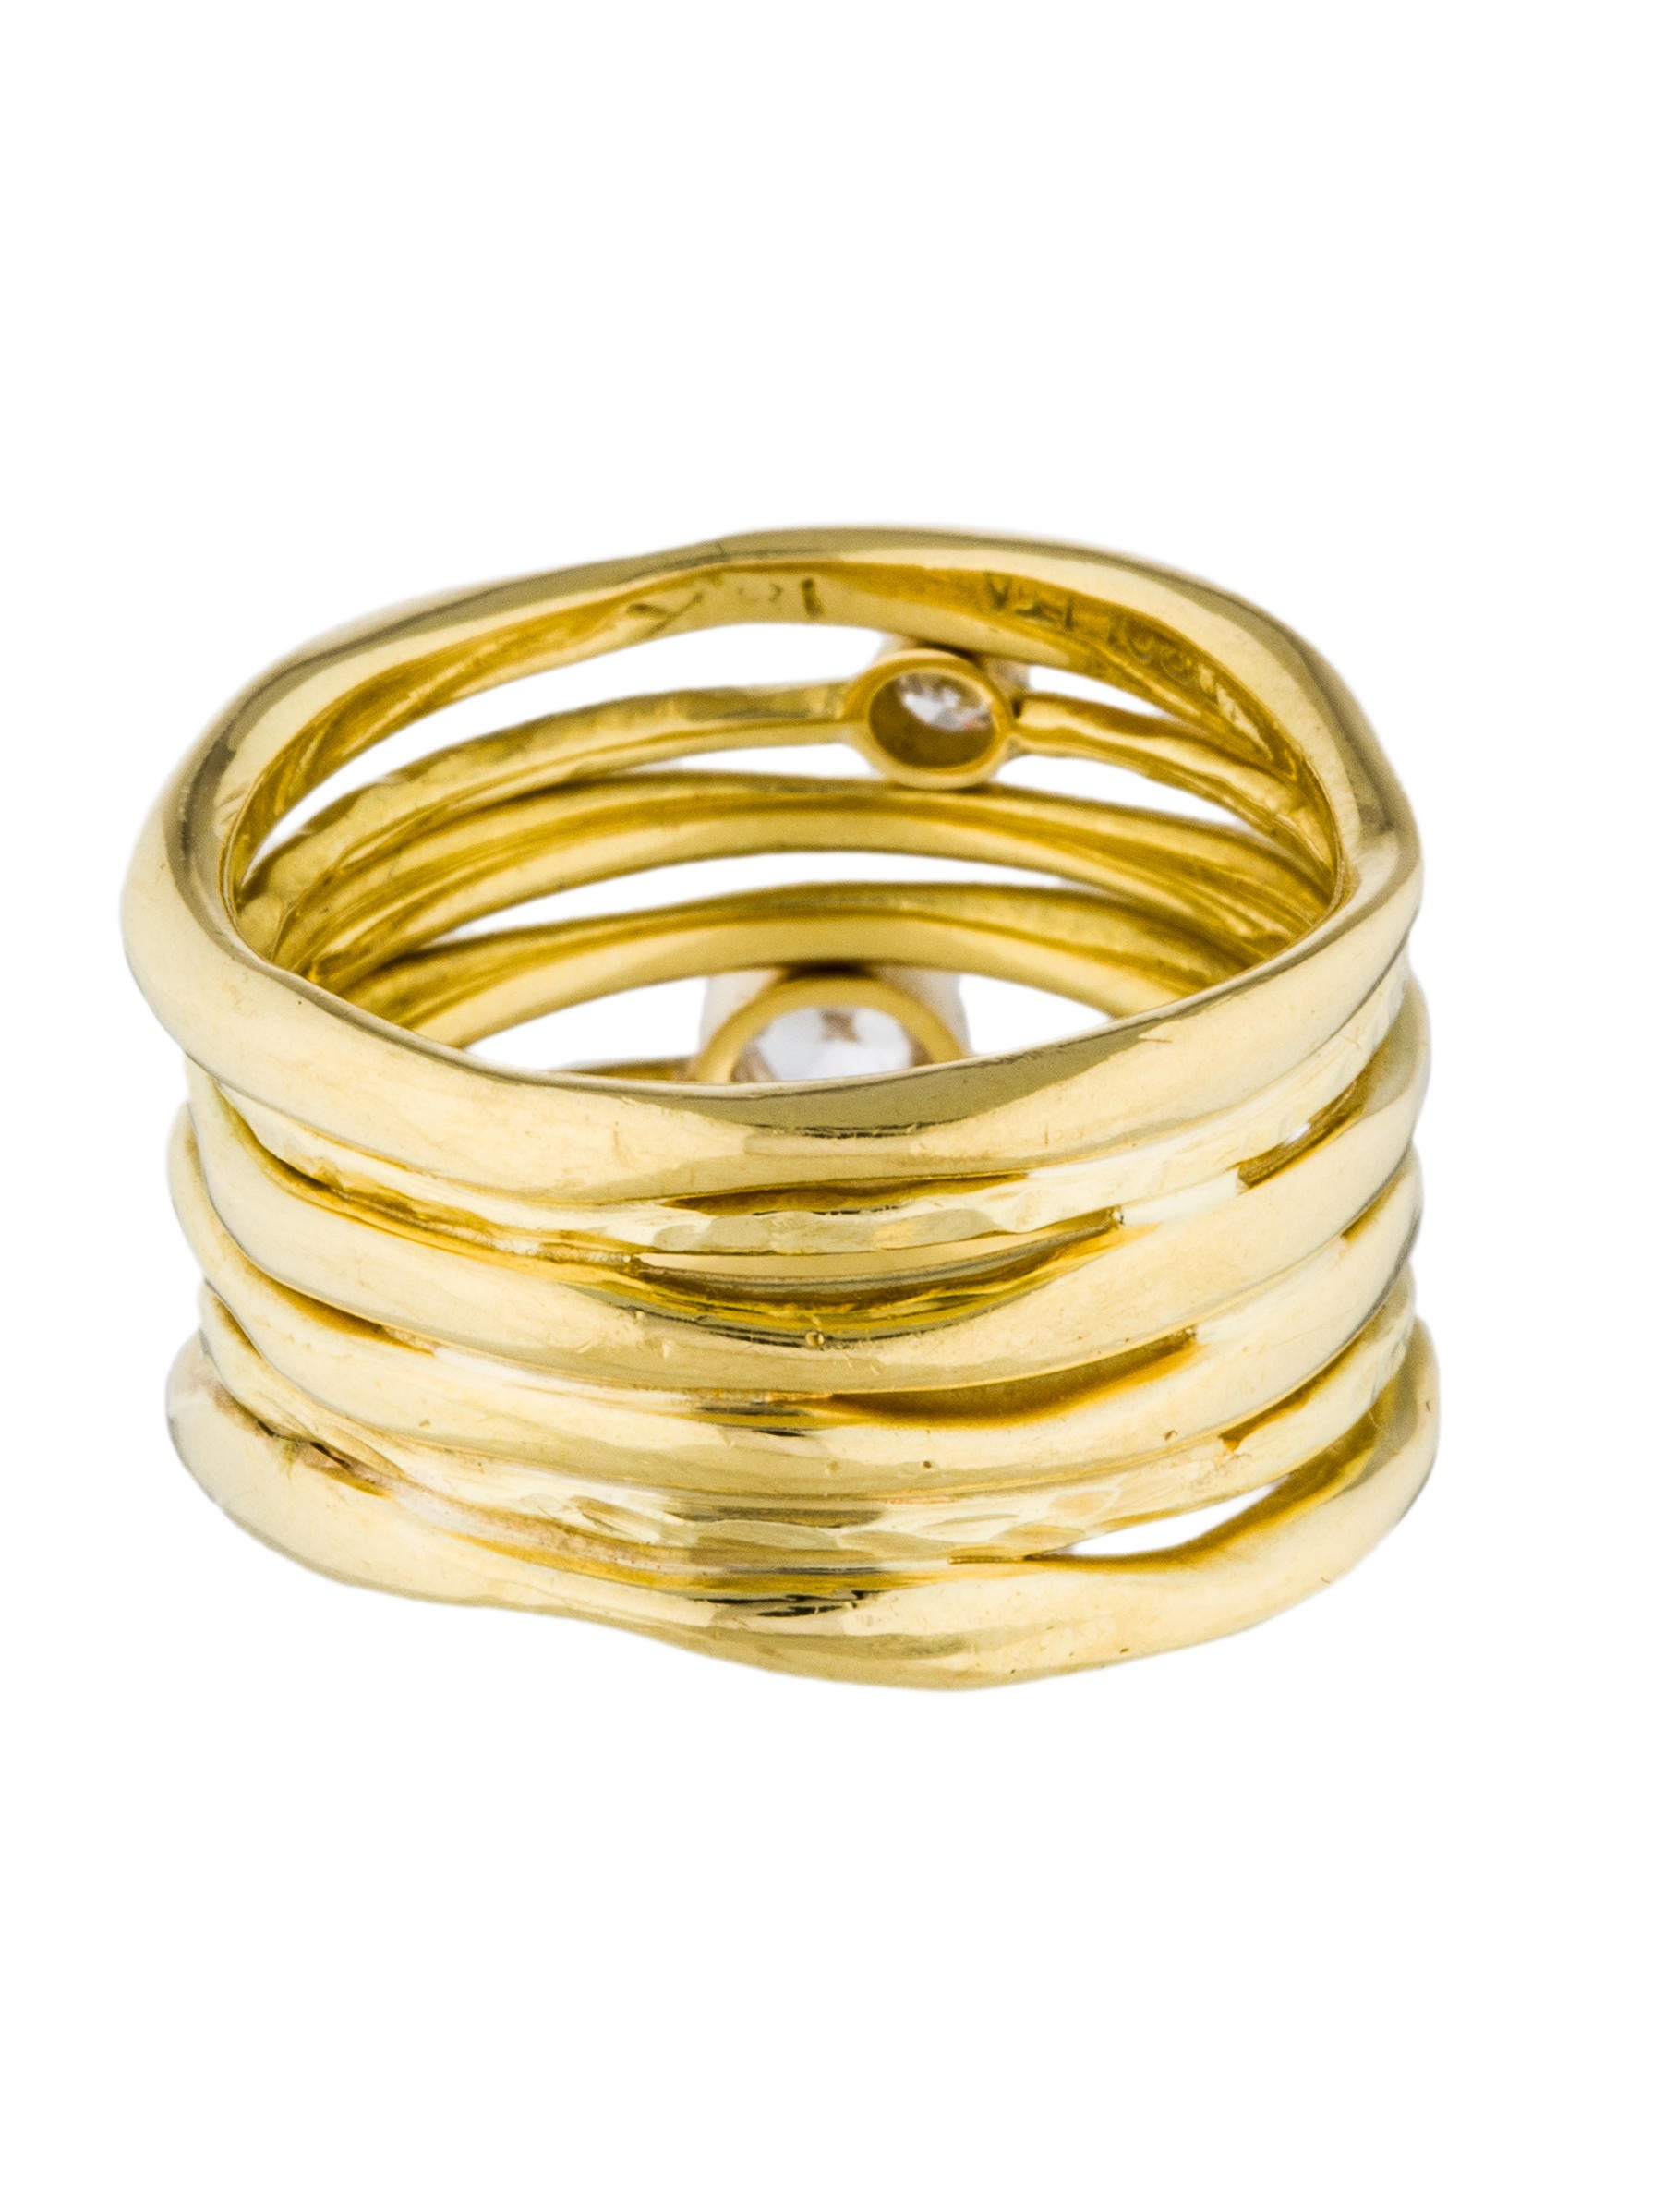 Ippolita 18k Diamond Movie Star Ring  Rings  Ipp26811. 8mm Tungsten Wedding Rings. First Wedding Rings. 8th Grade Rings. Folded Metal Wedding Rings. Girlfriend Wedding Rings. Hd Wedding Wedding Rings. Star Engagement Rings. Modern Man's Wedding Rings